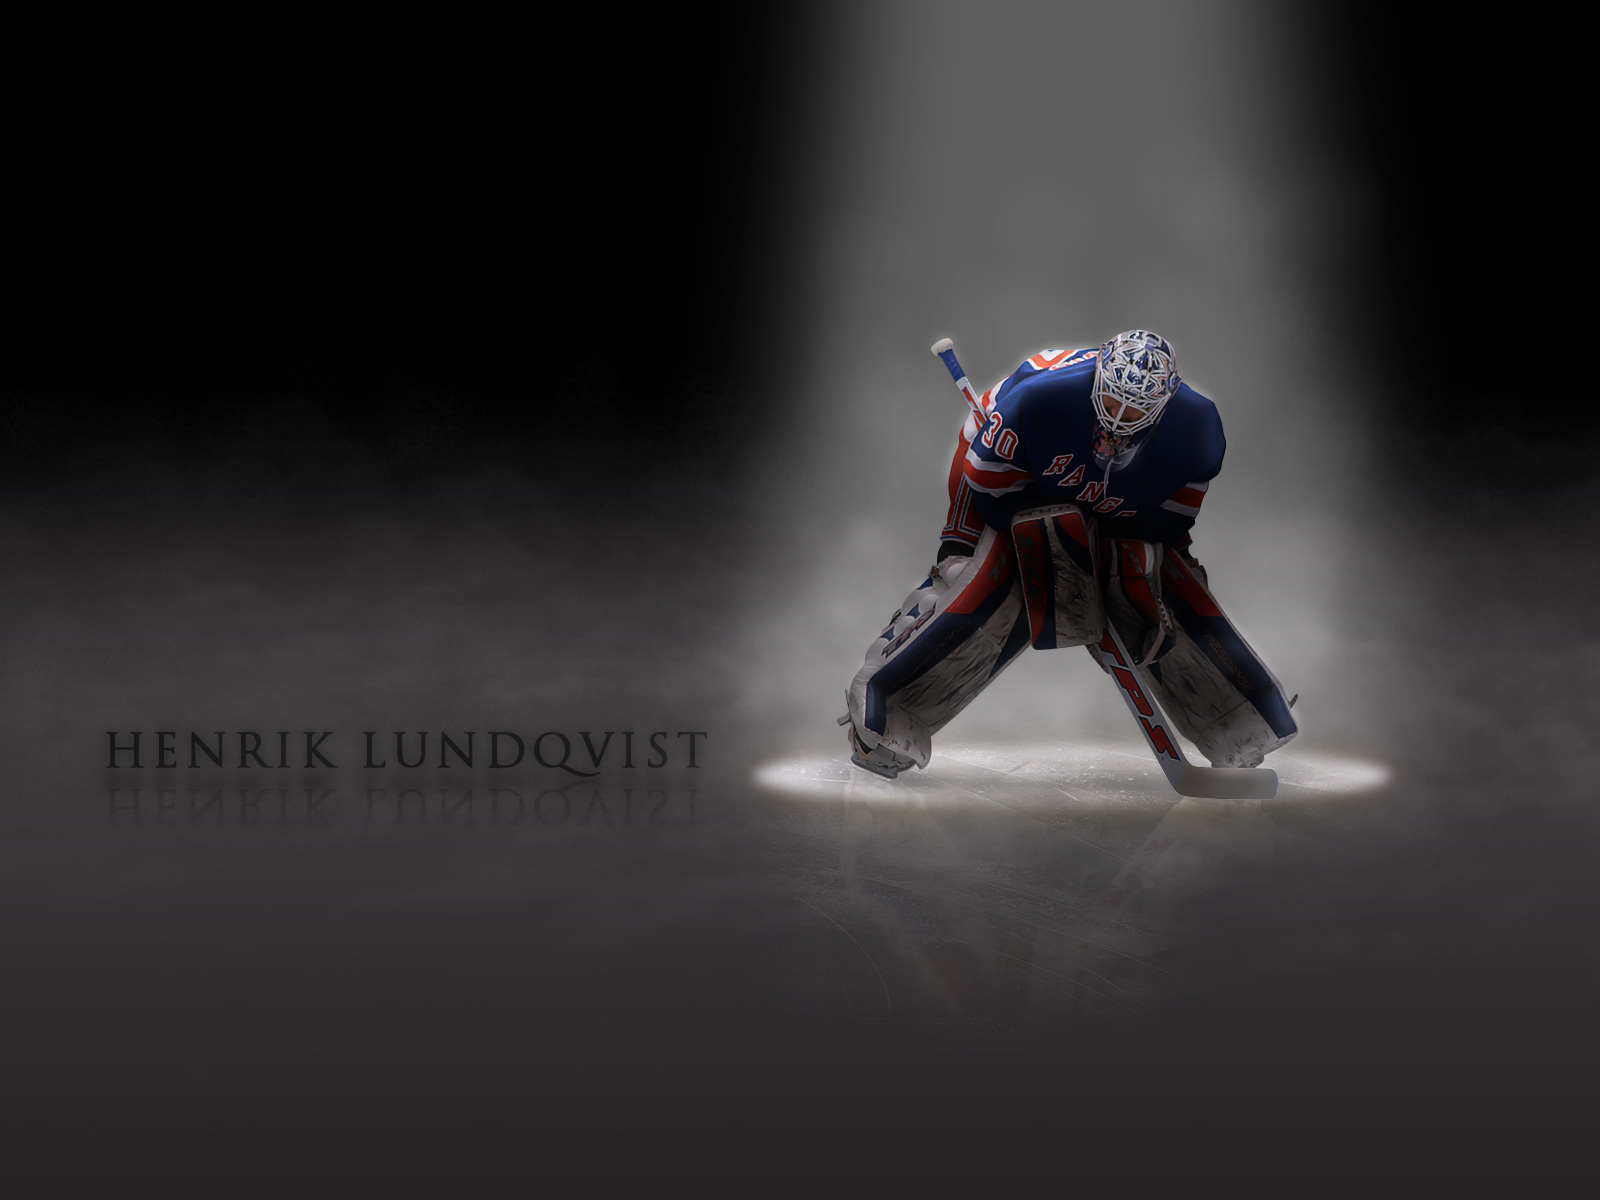 Hockey Henrik Lundqvist New York Rangers wallpaper 1600x1200 1600x1200